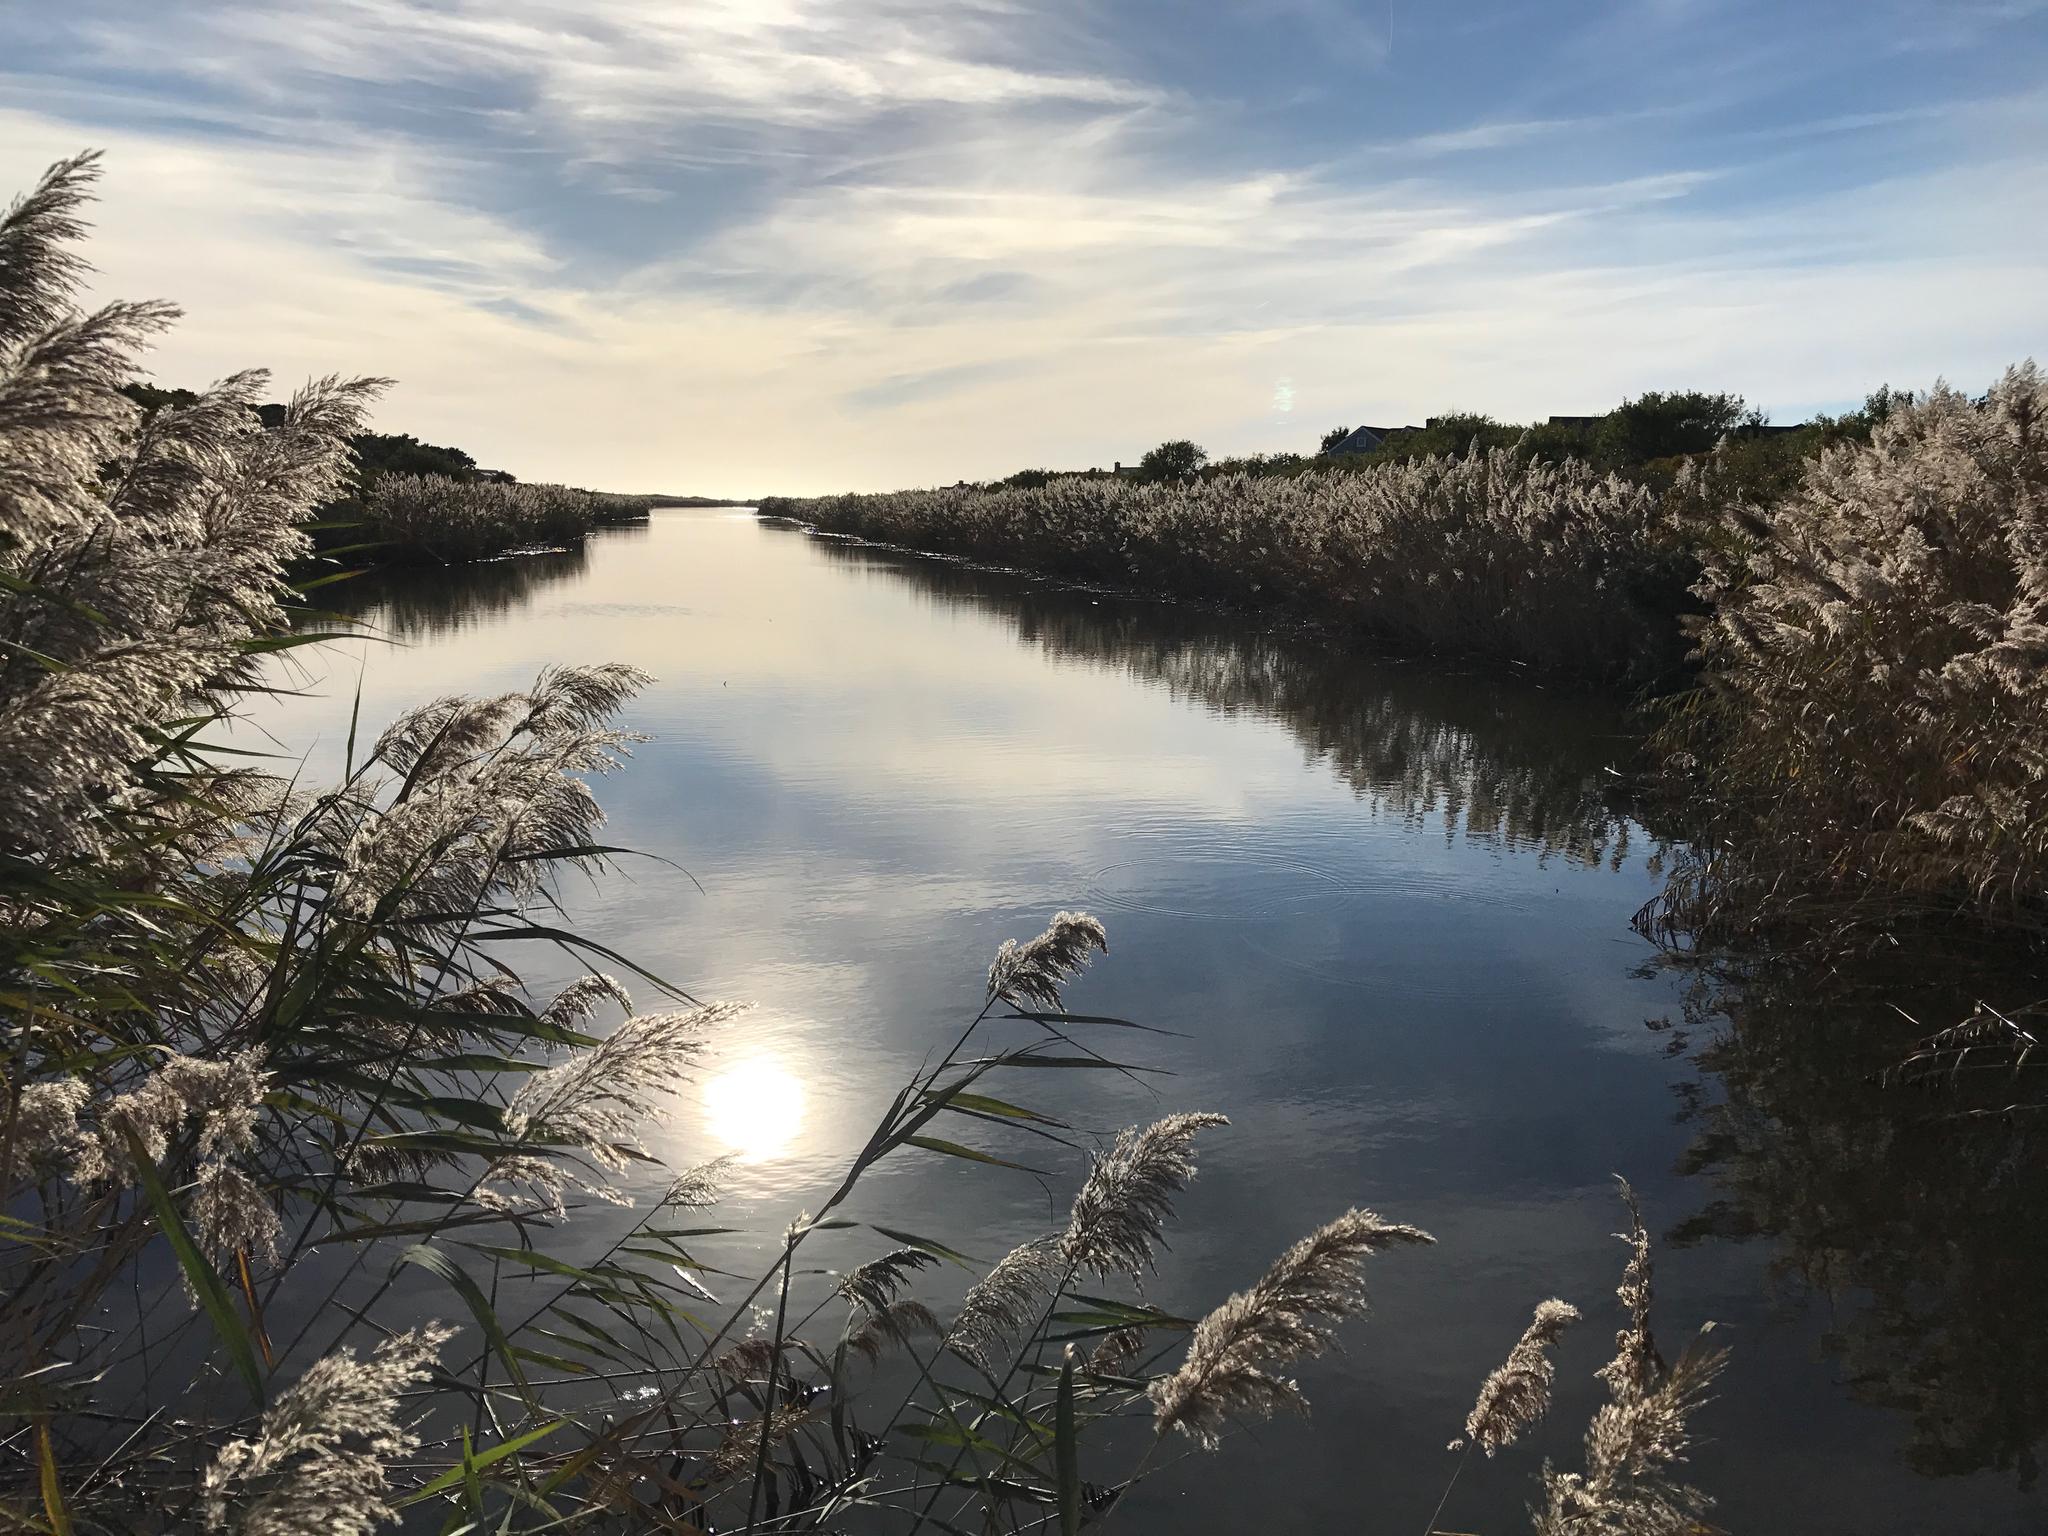 Long Pond, Nantucket, MA